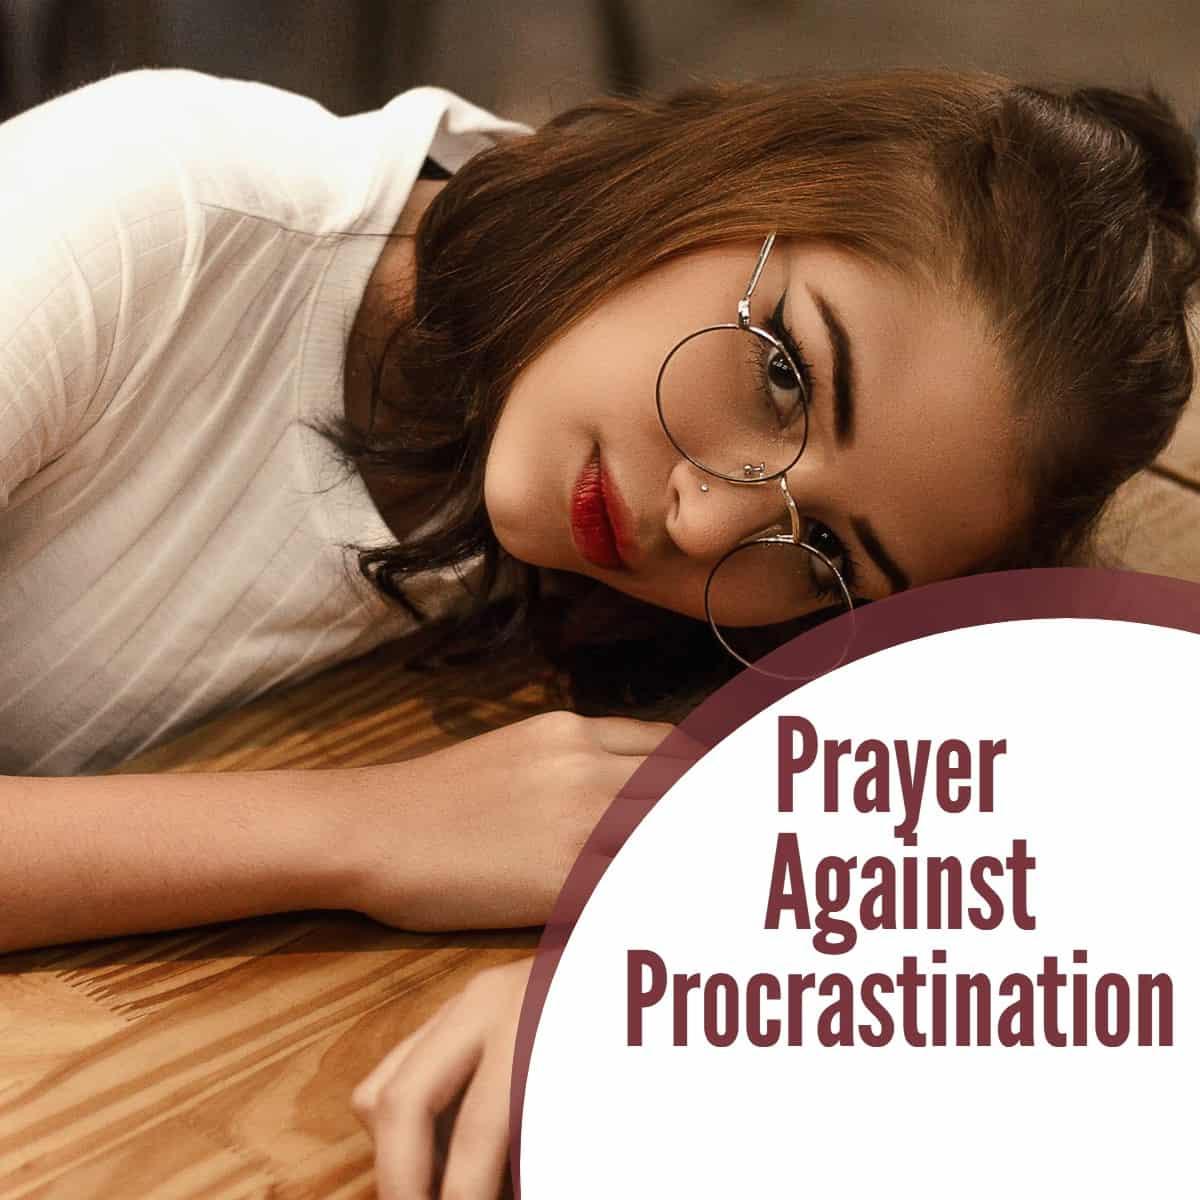 Prayer Against Procrastination